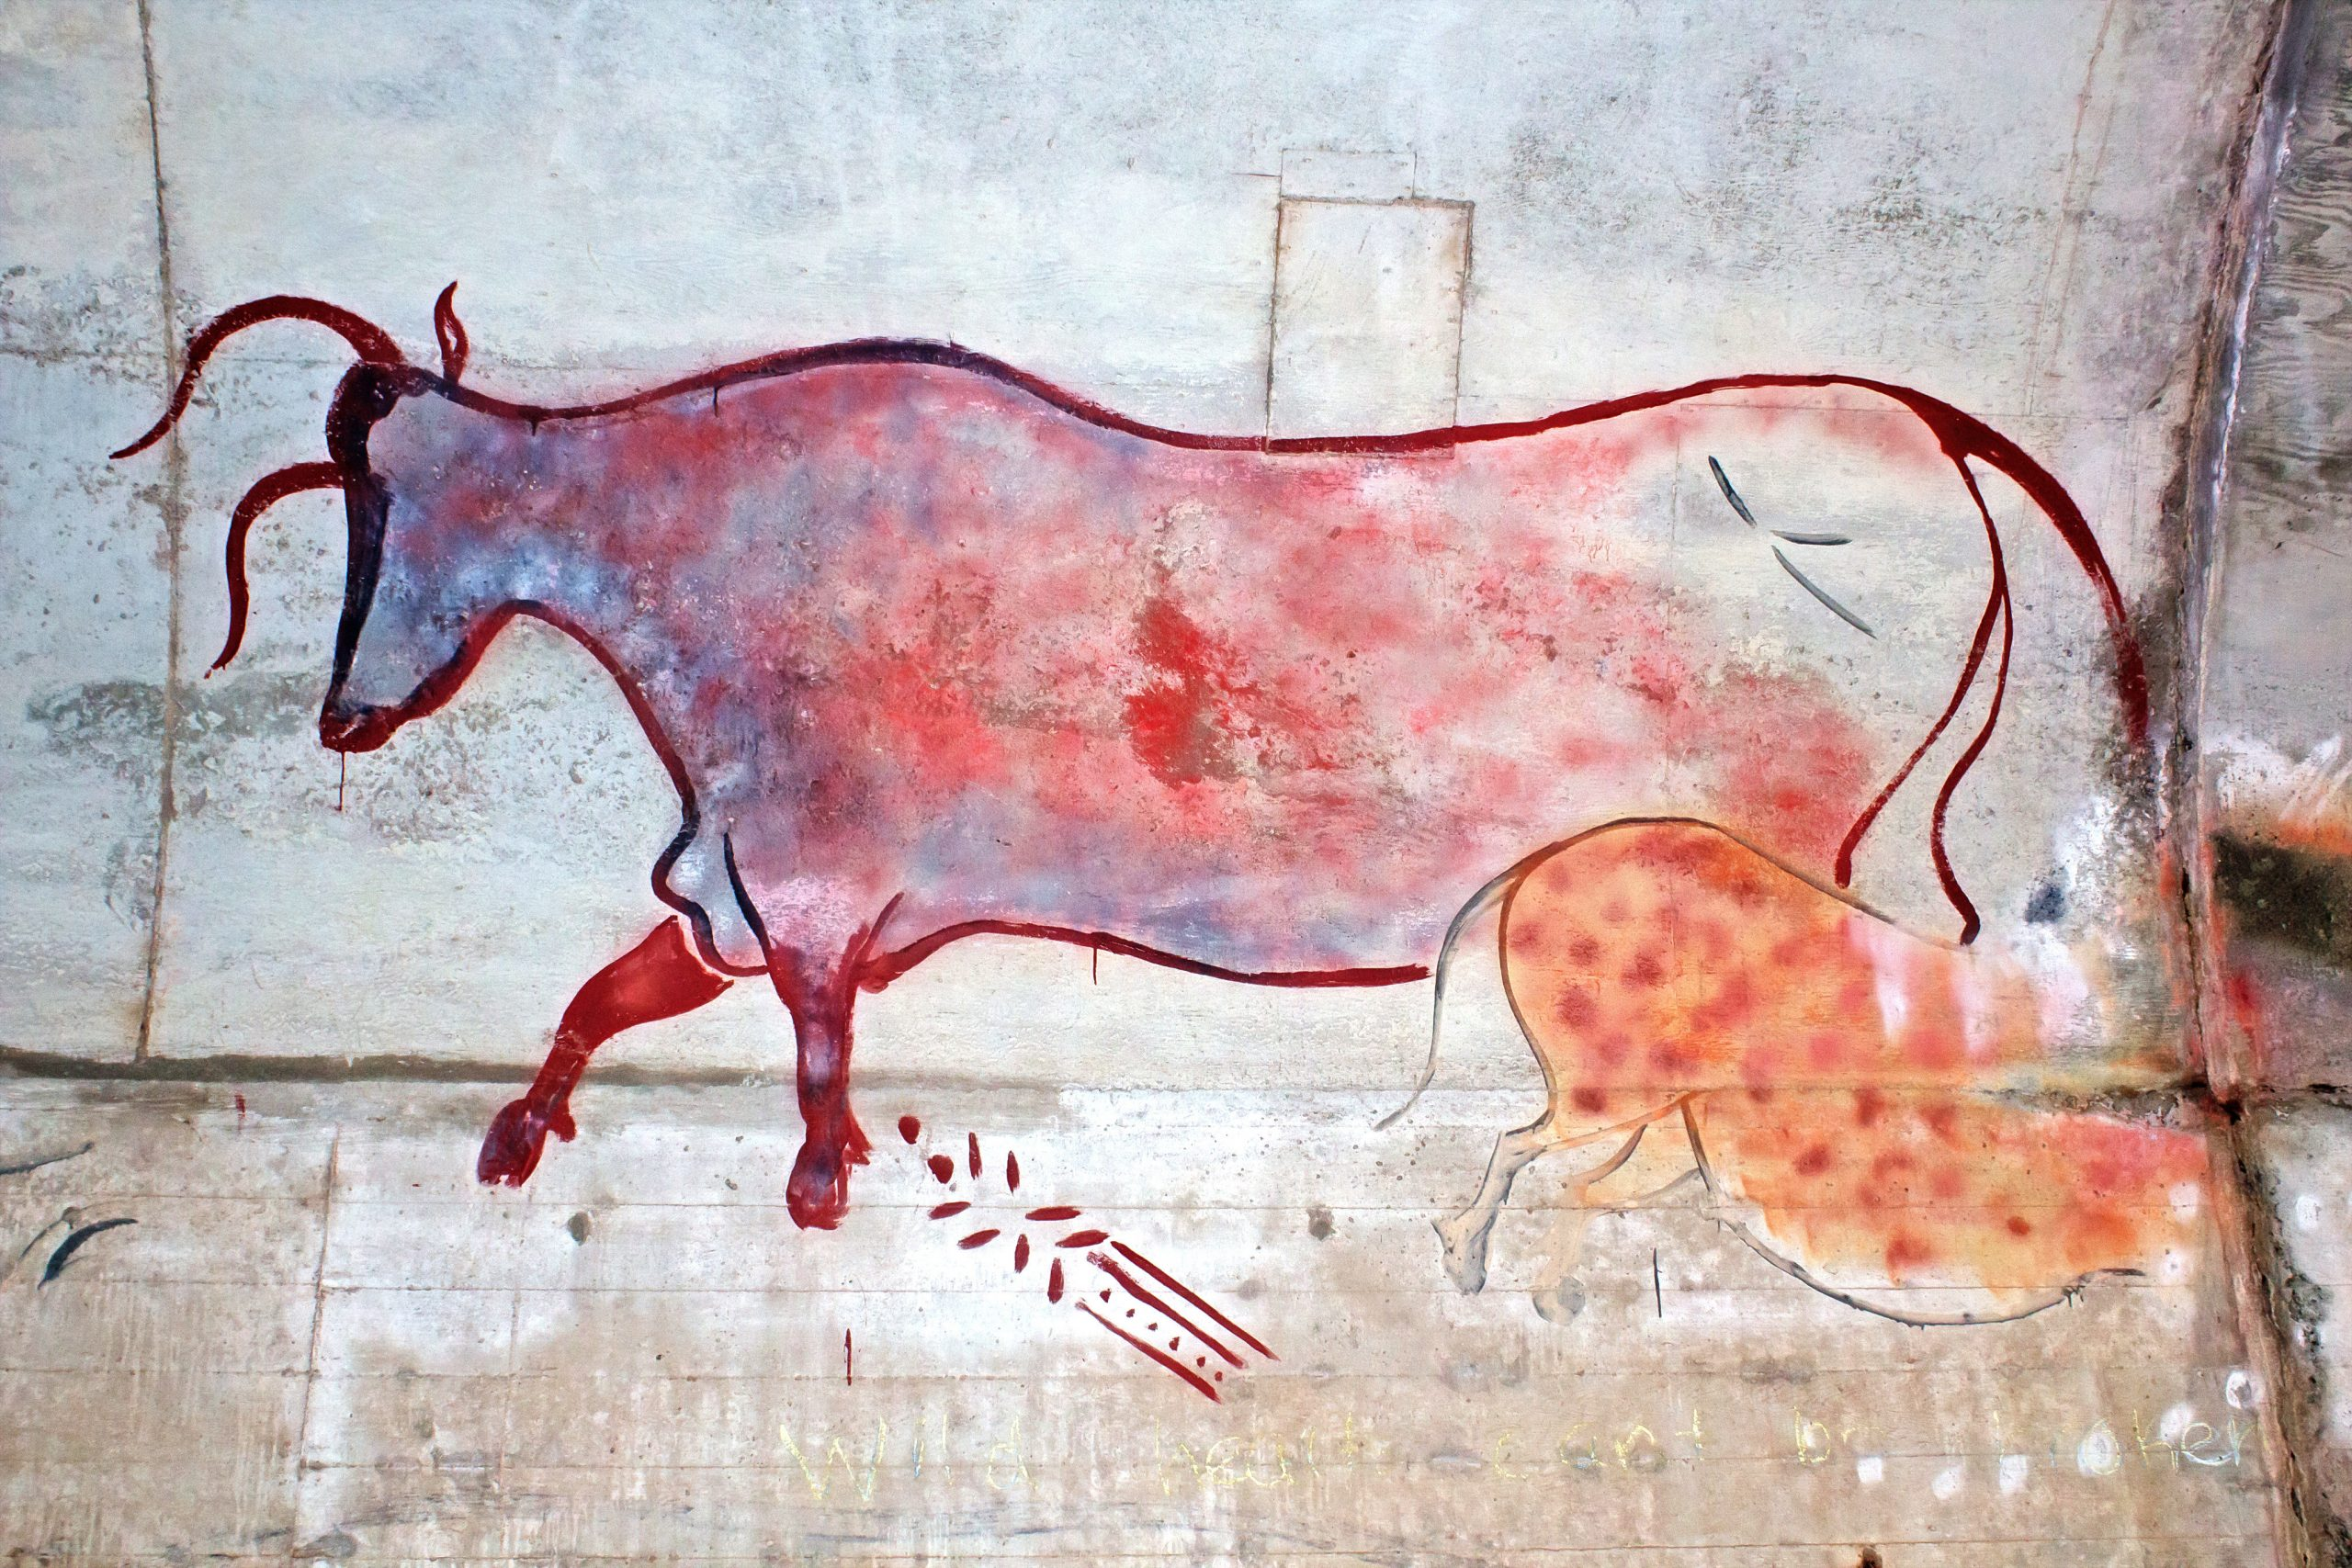 graffiti-animal_fk-2CU_